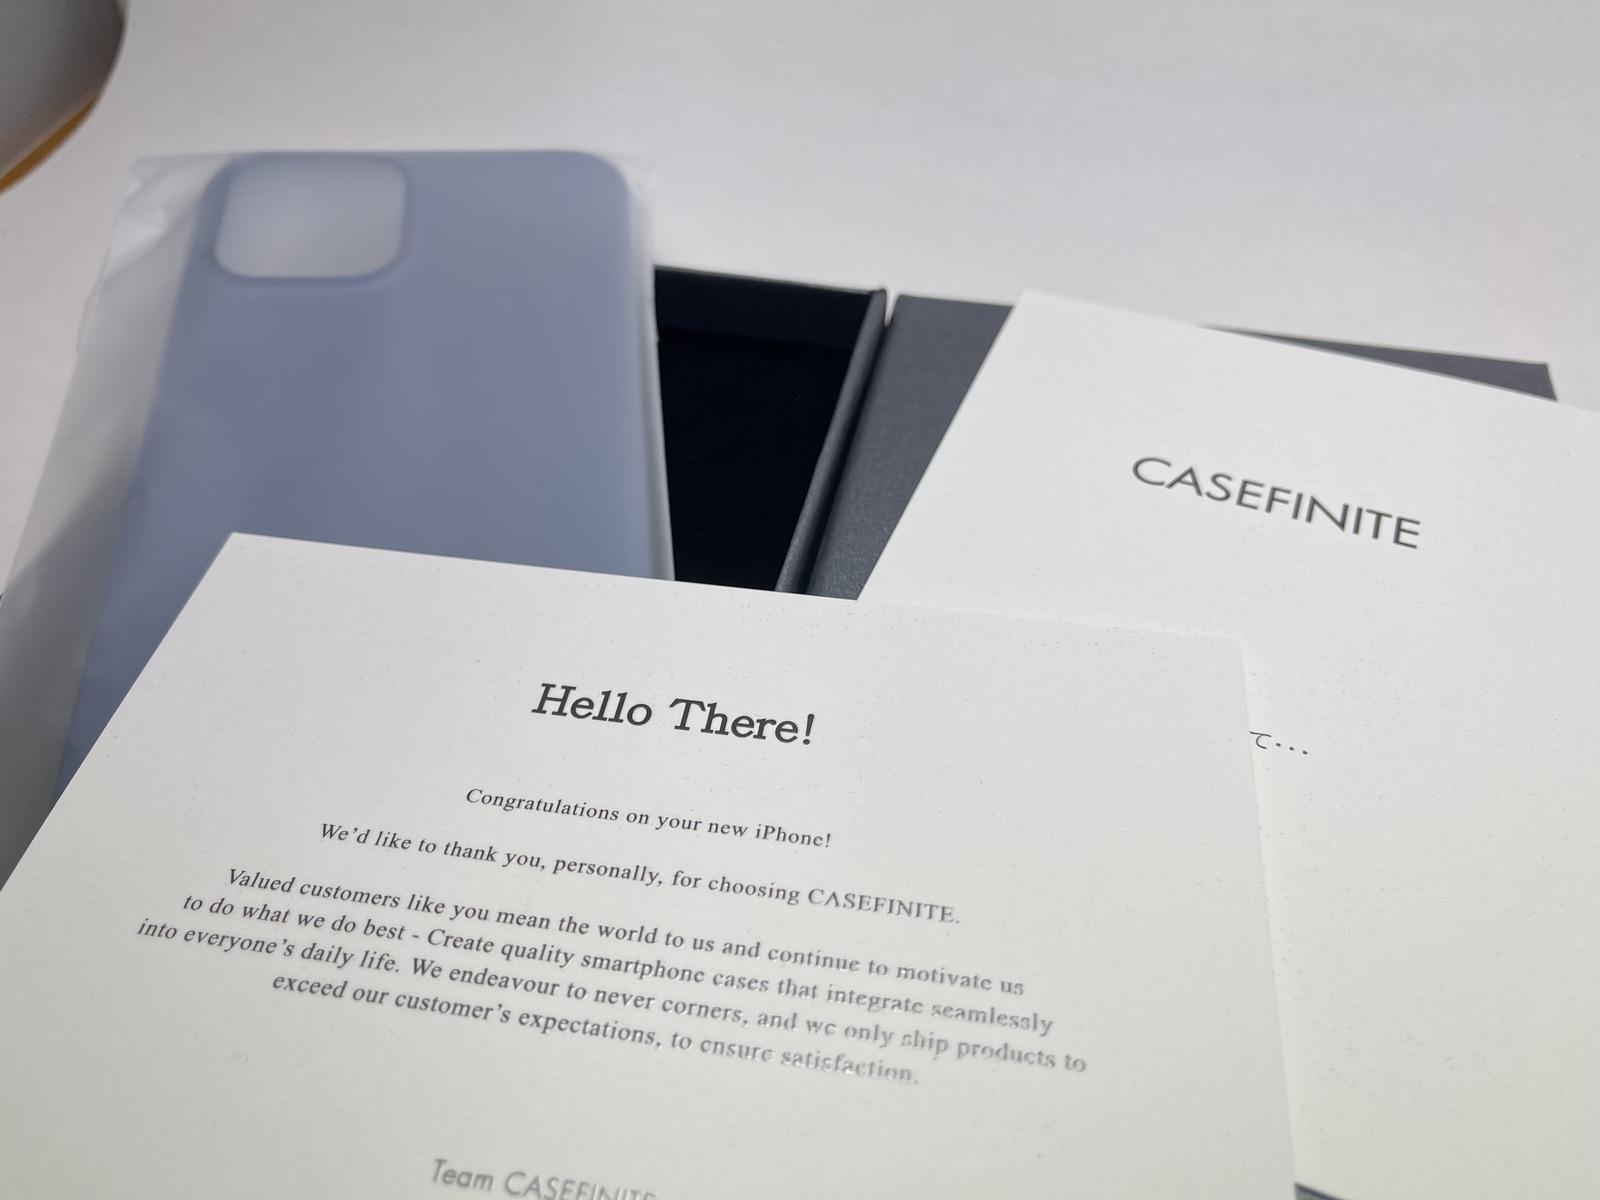 iphone12-case-10-photo-003